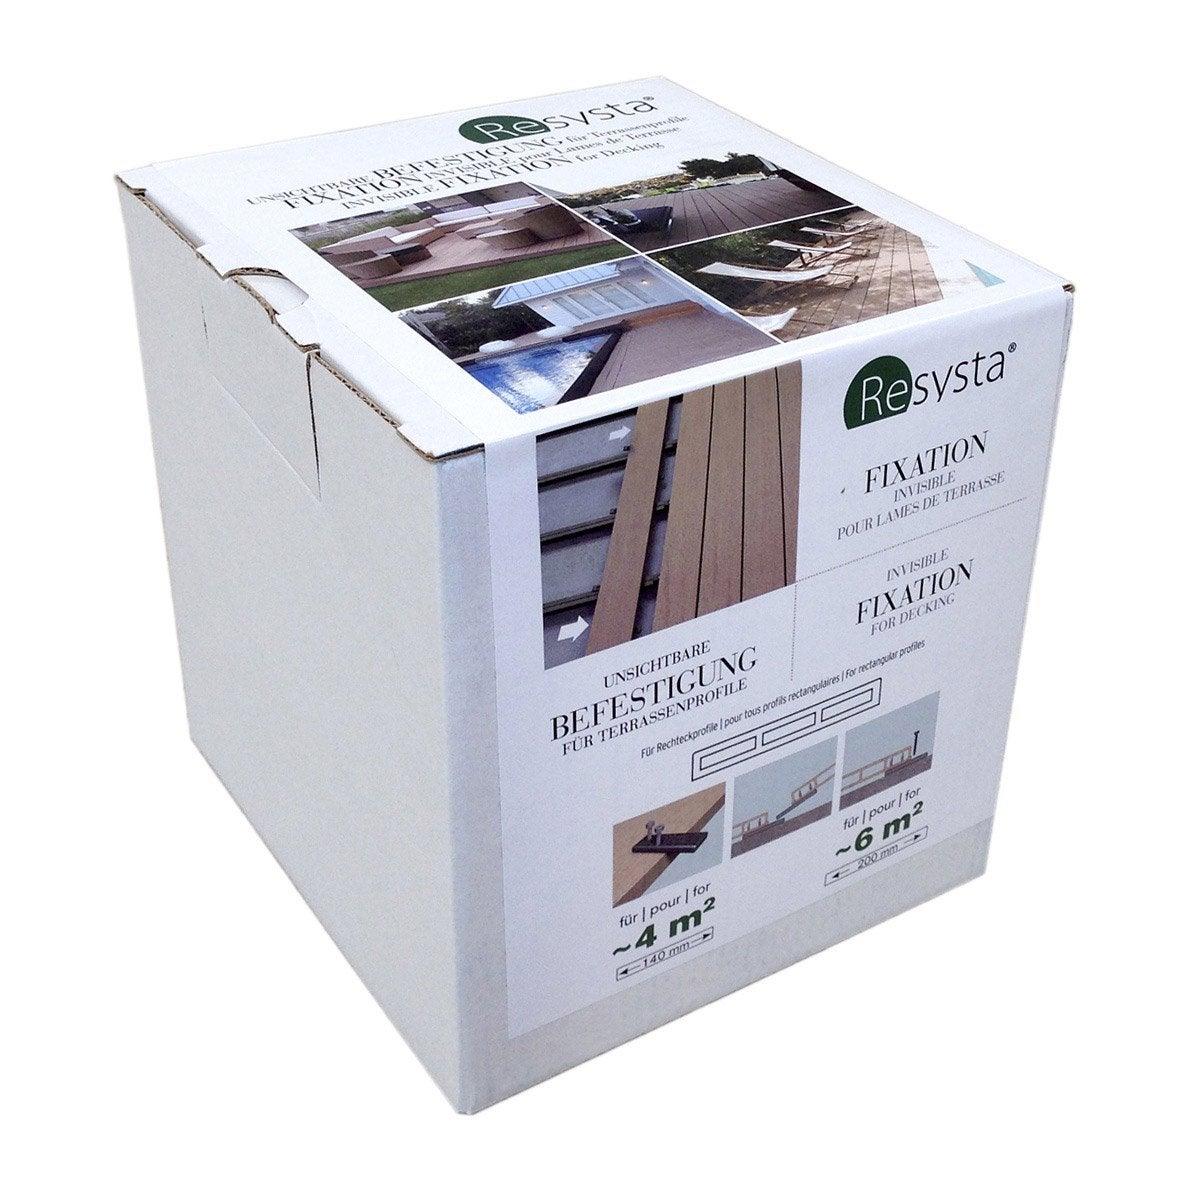 syst me de fixation lot de 120 syst me de fixation invisible leroy merlin. Black Bedroom Furniture Sets. Home Design Ideas